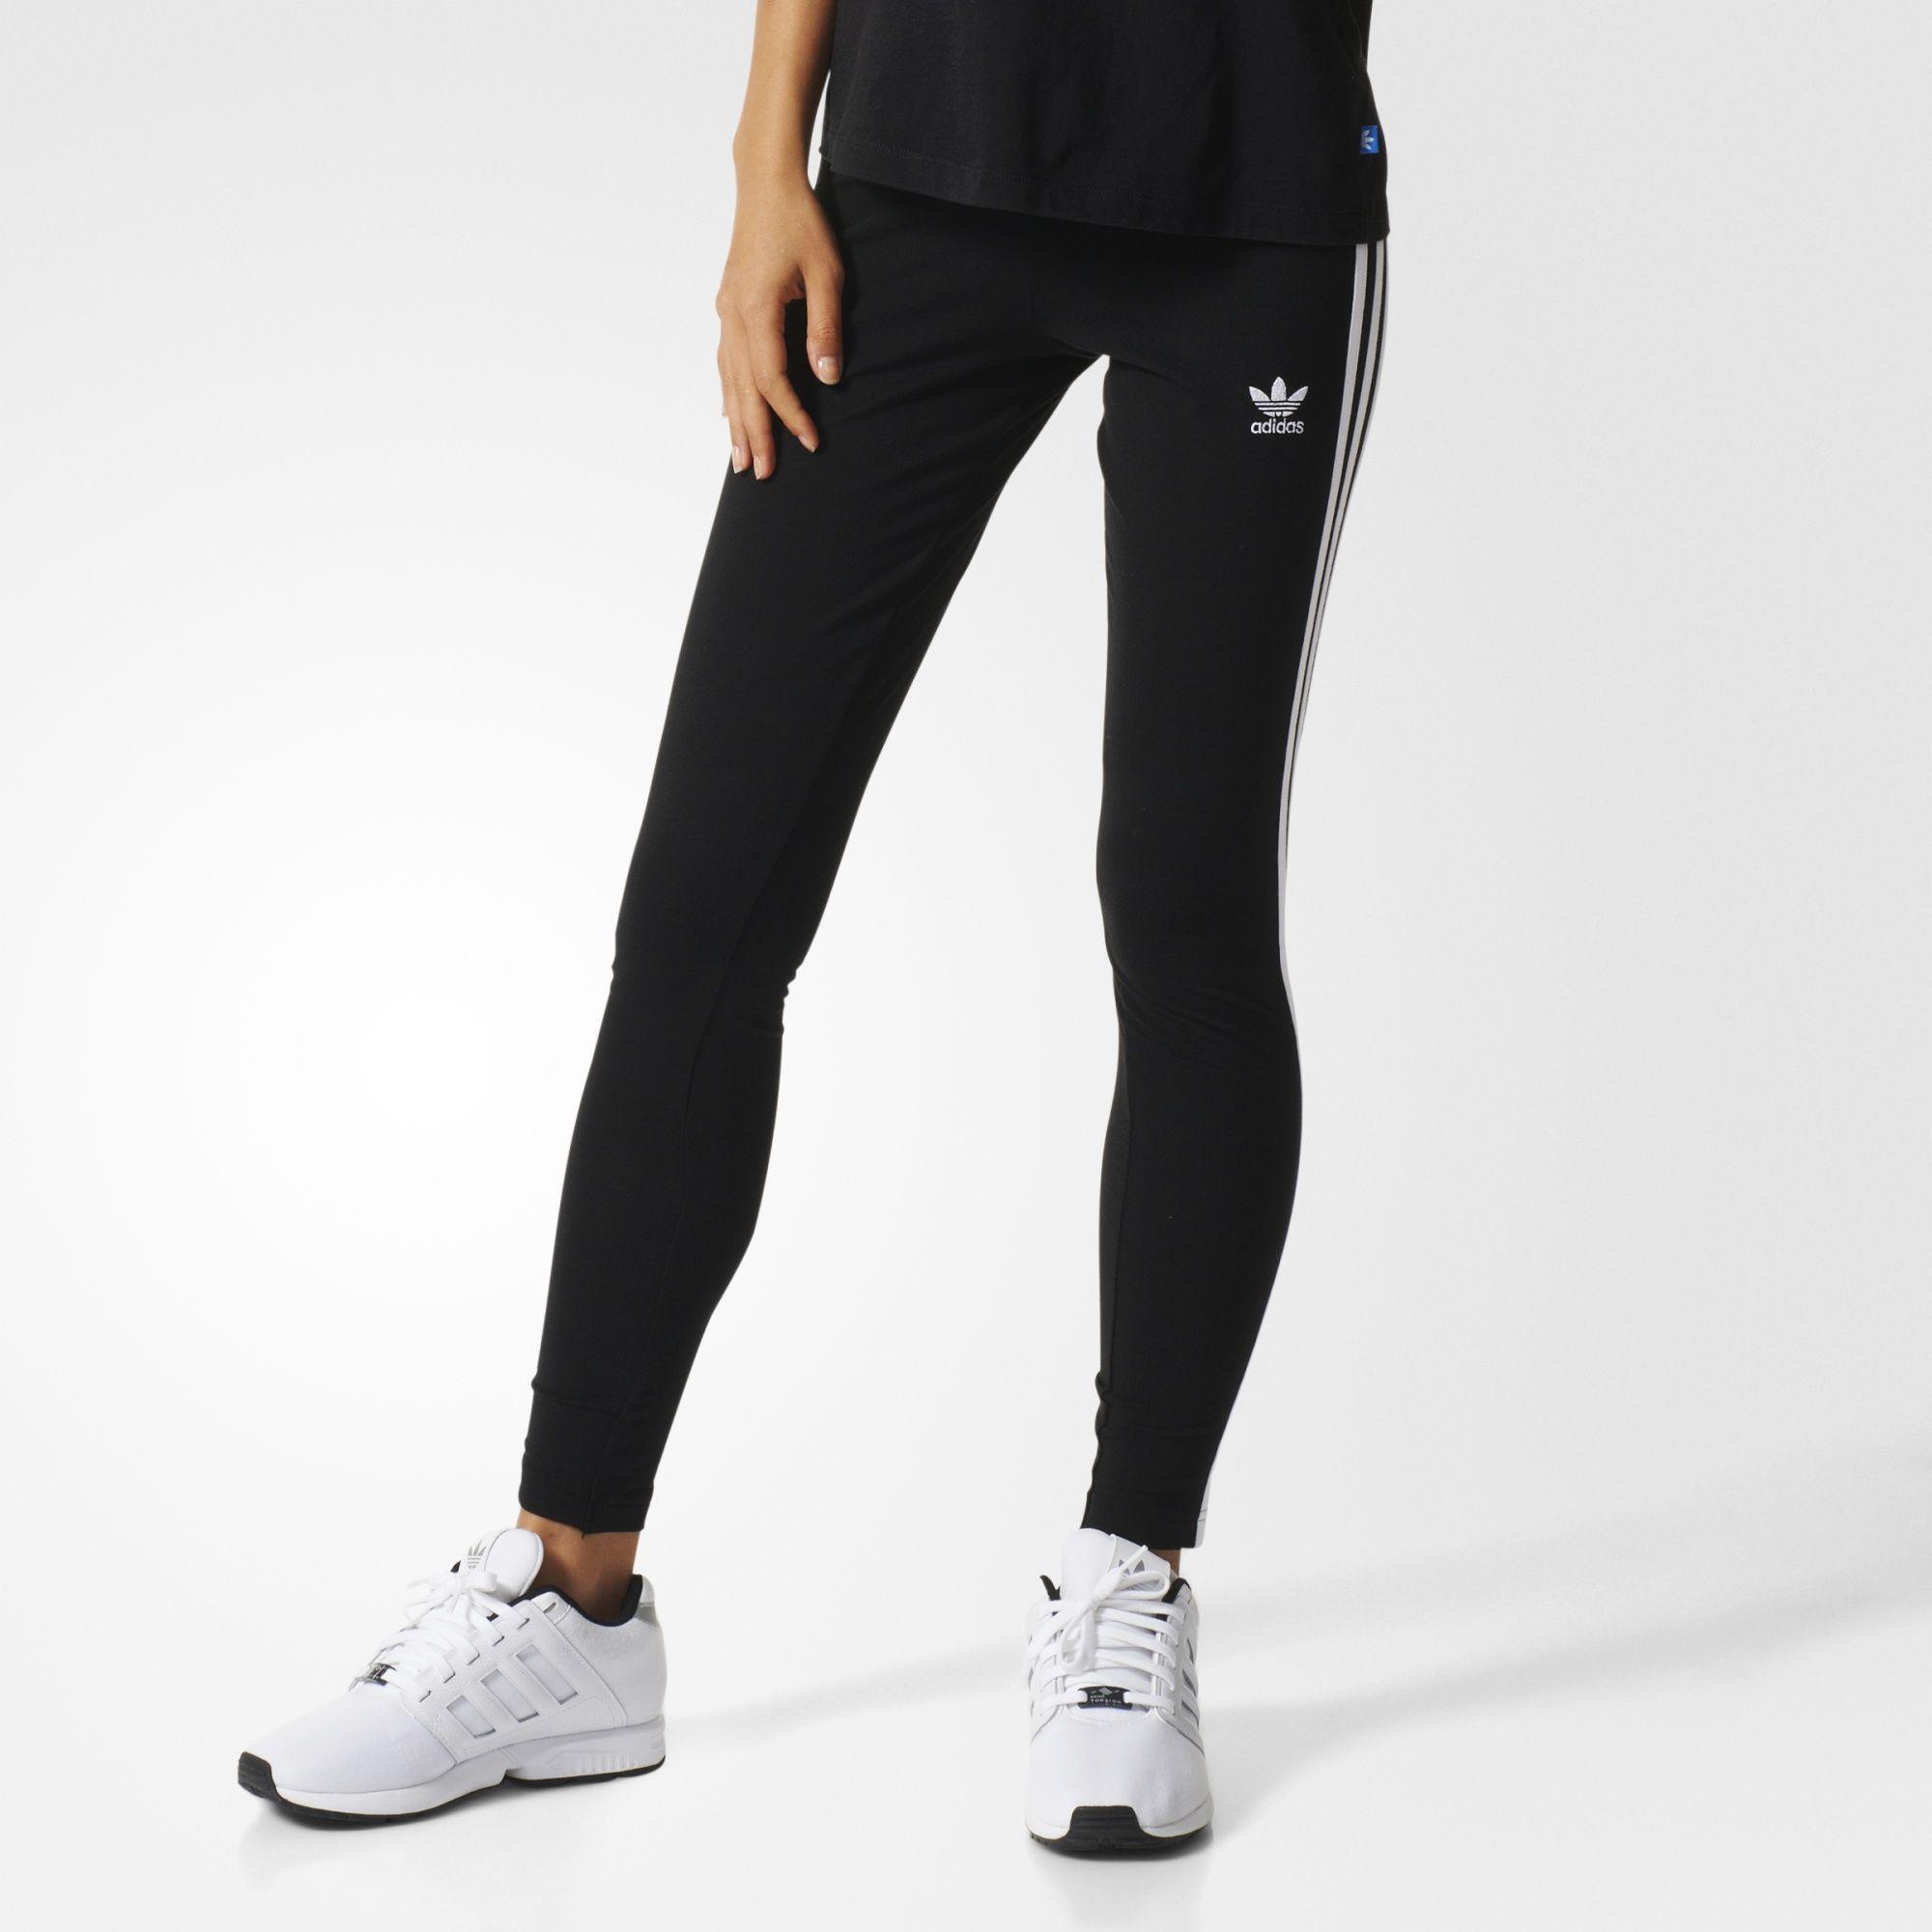 adidas - Women's 3-Stripes Leggings